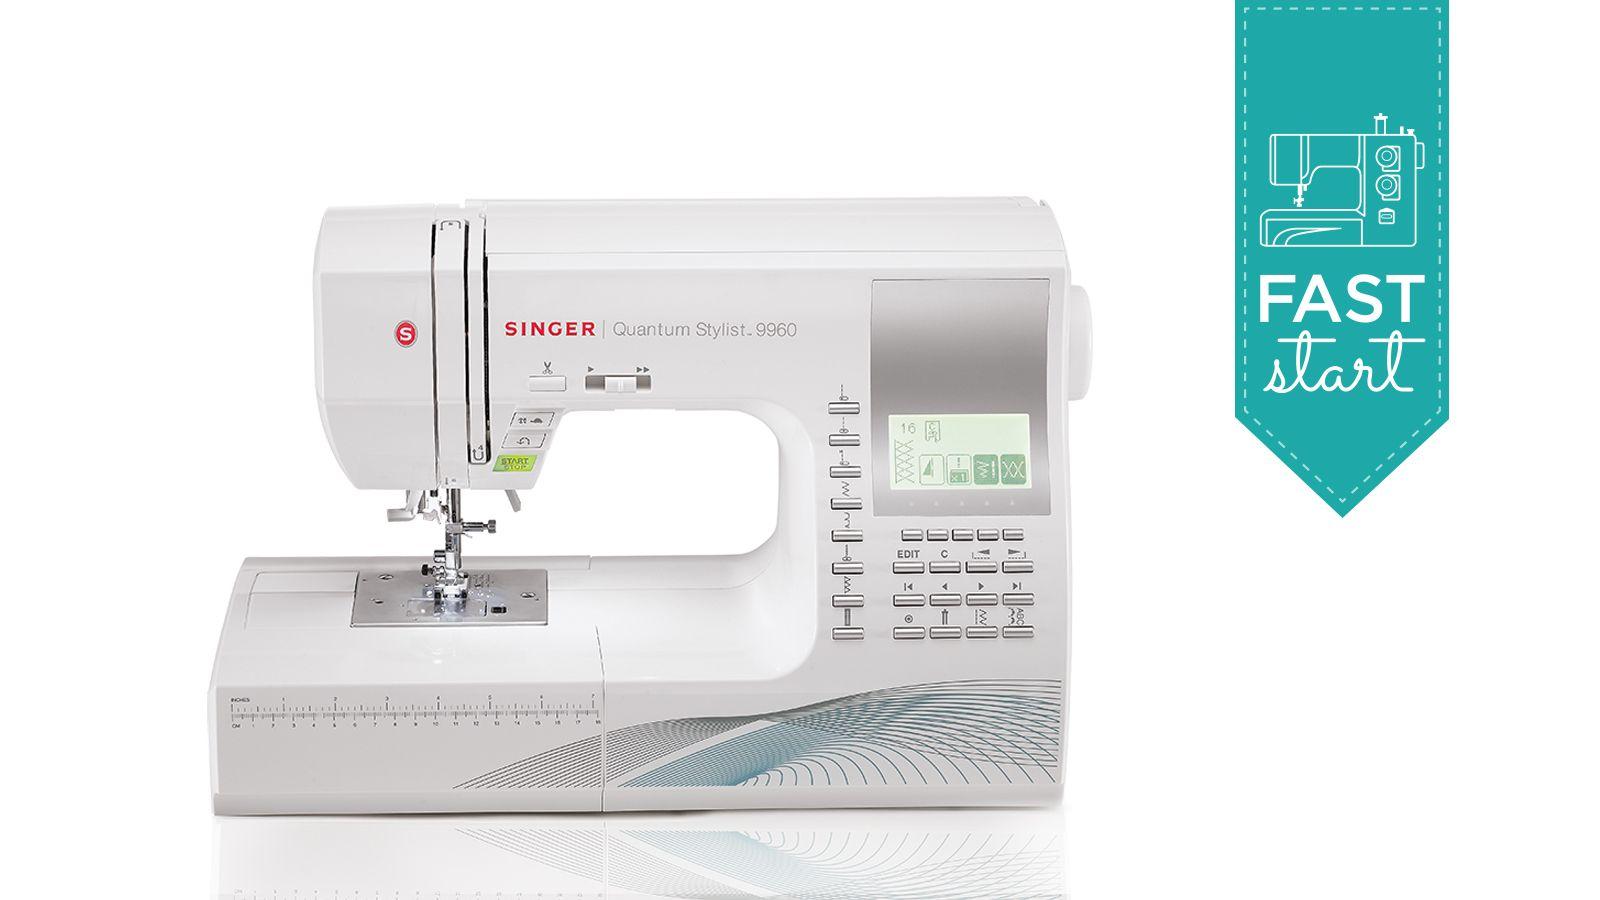 Singer Quantum Stylist™ Sewing Machine Model 9960 - Fast Start